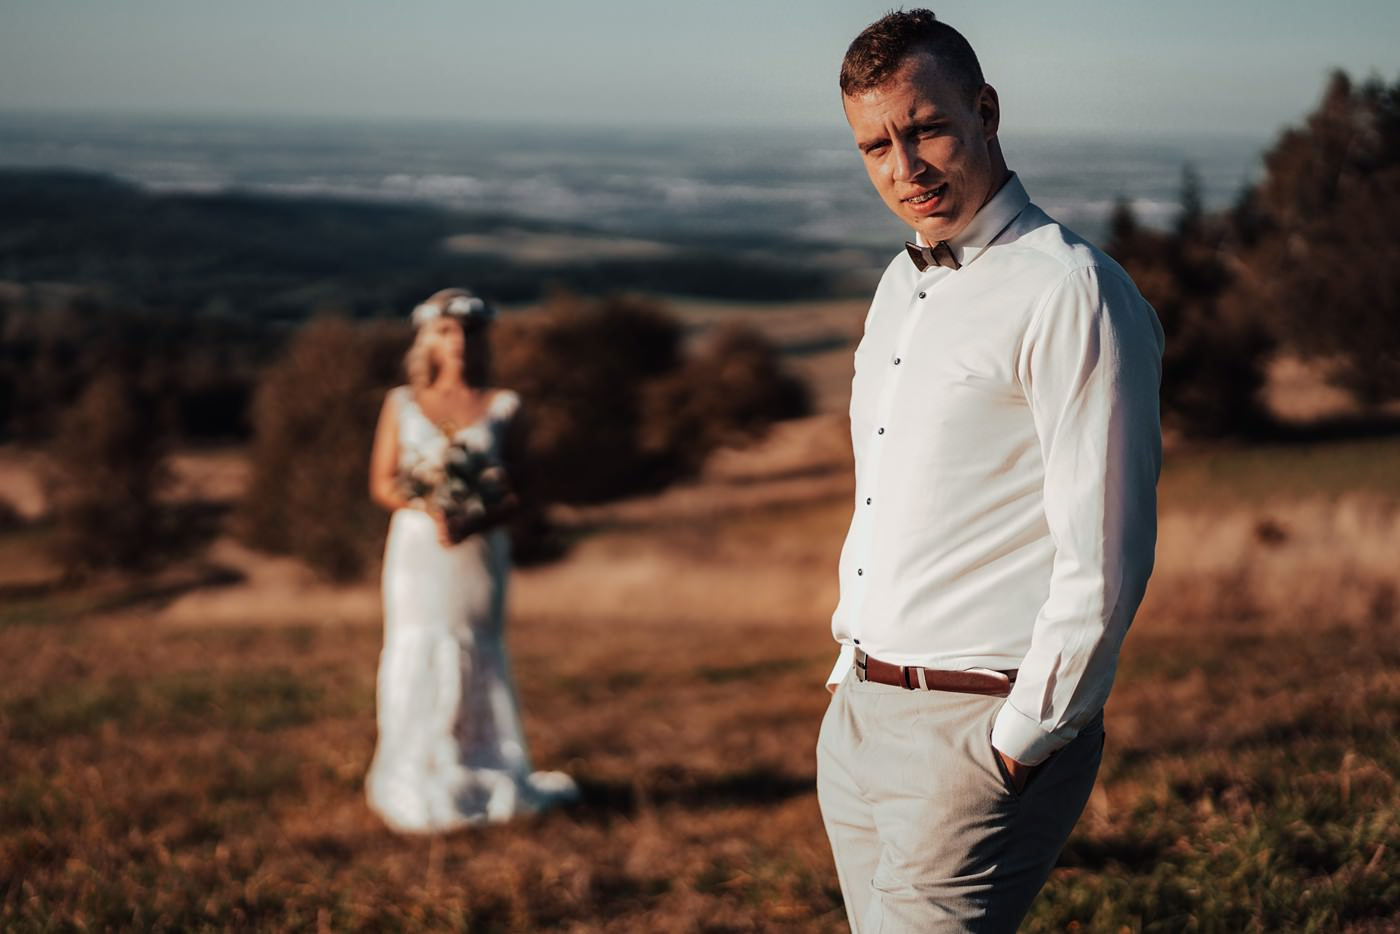 Martyna & Bartek - Wesele w Górach Sowich 102